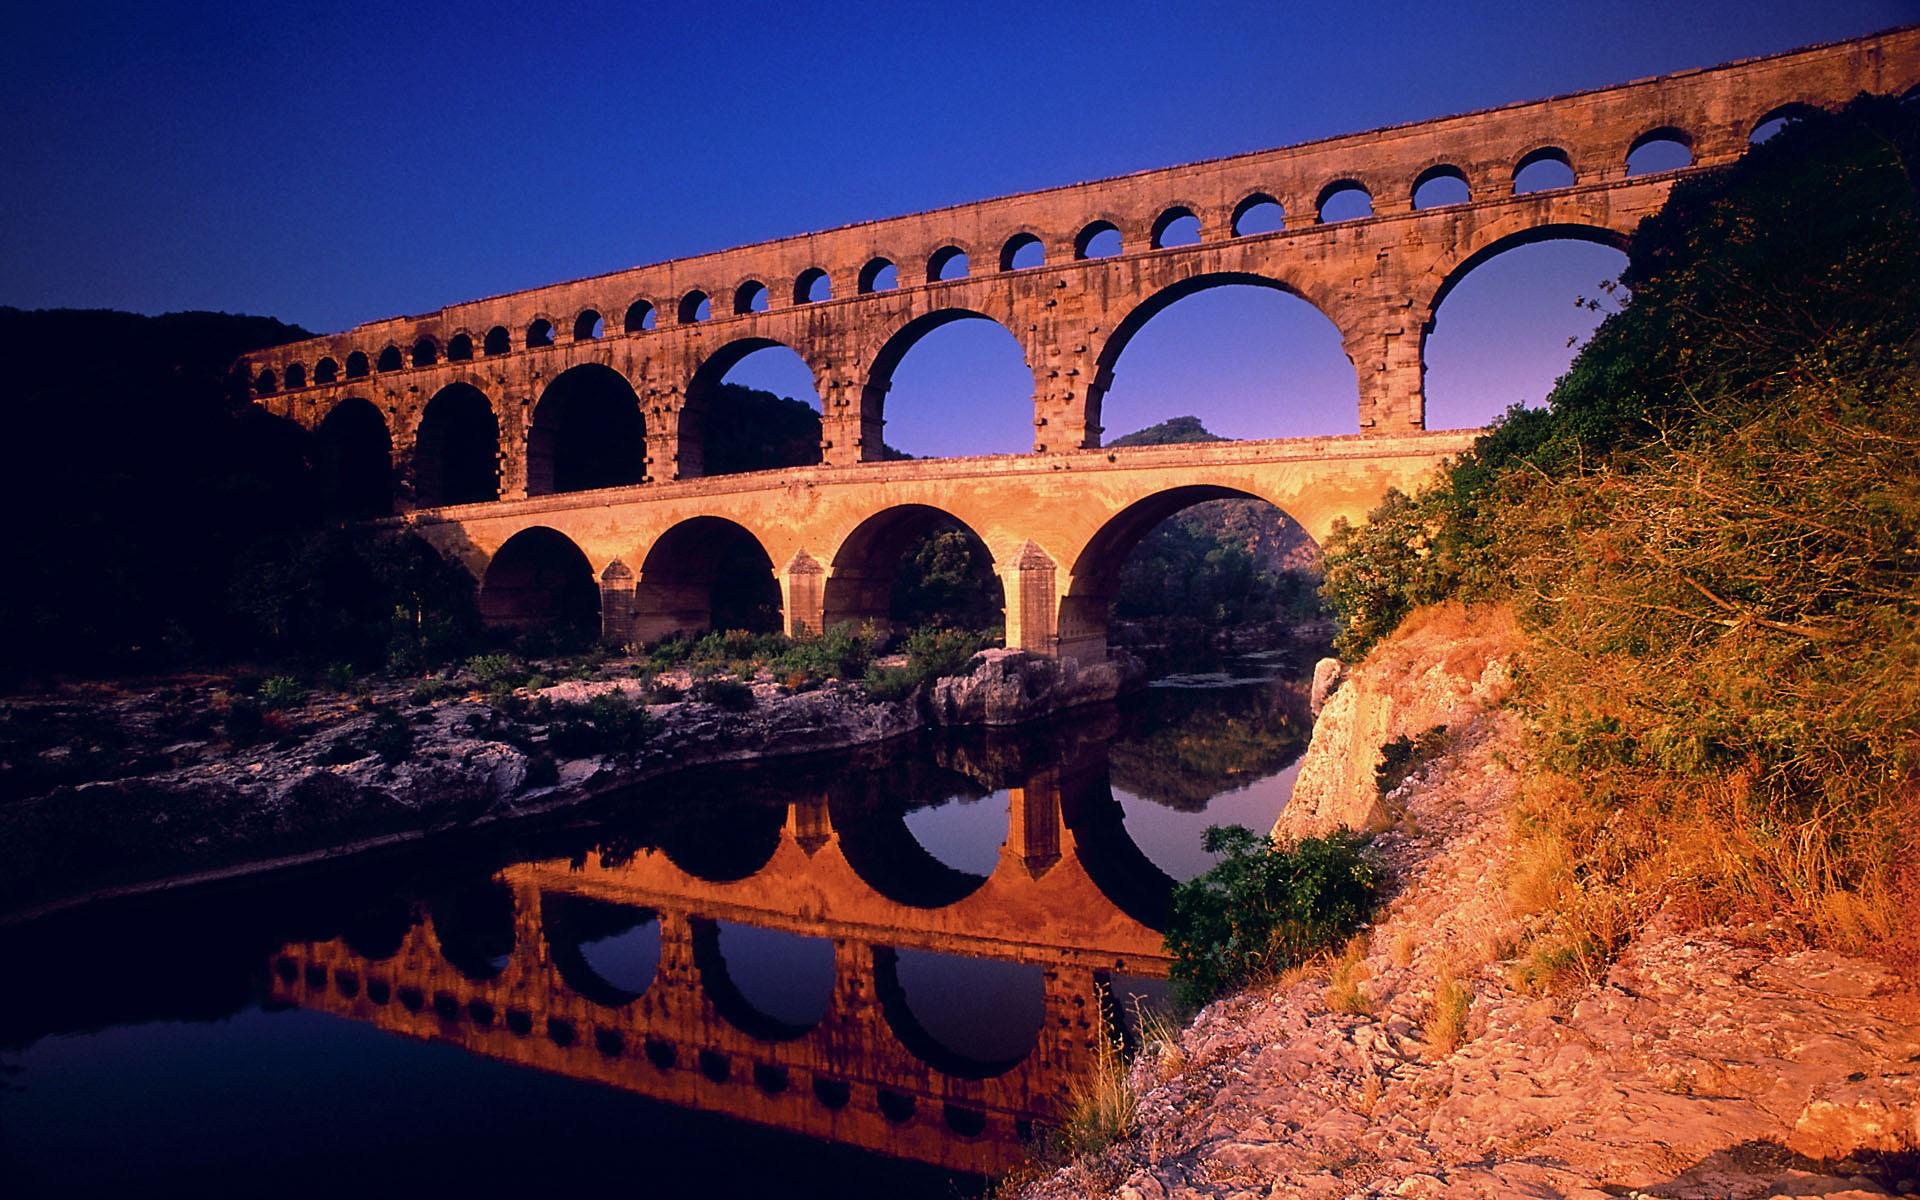 Pont du Gard Languedoc-Roussillon in France Wallpaper ... Pont Du Gard Top